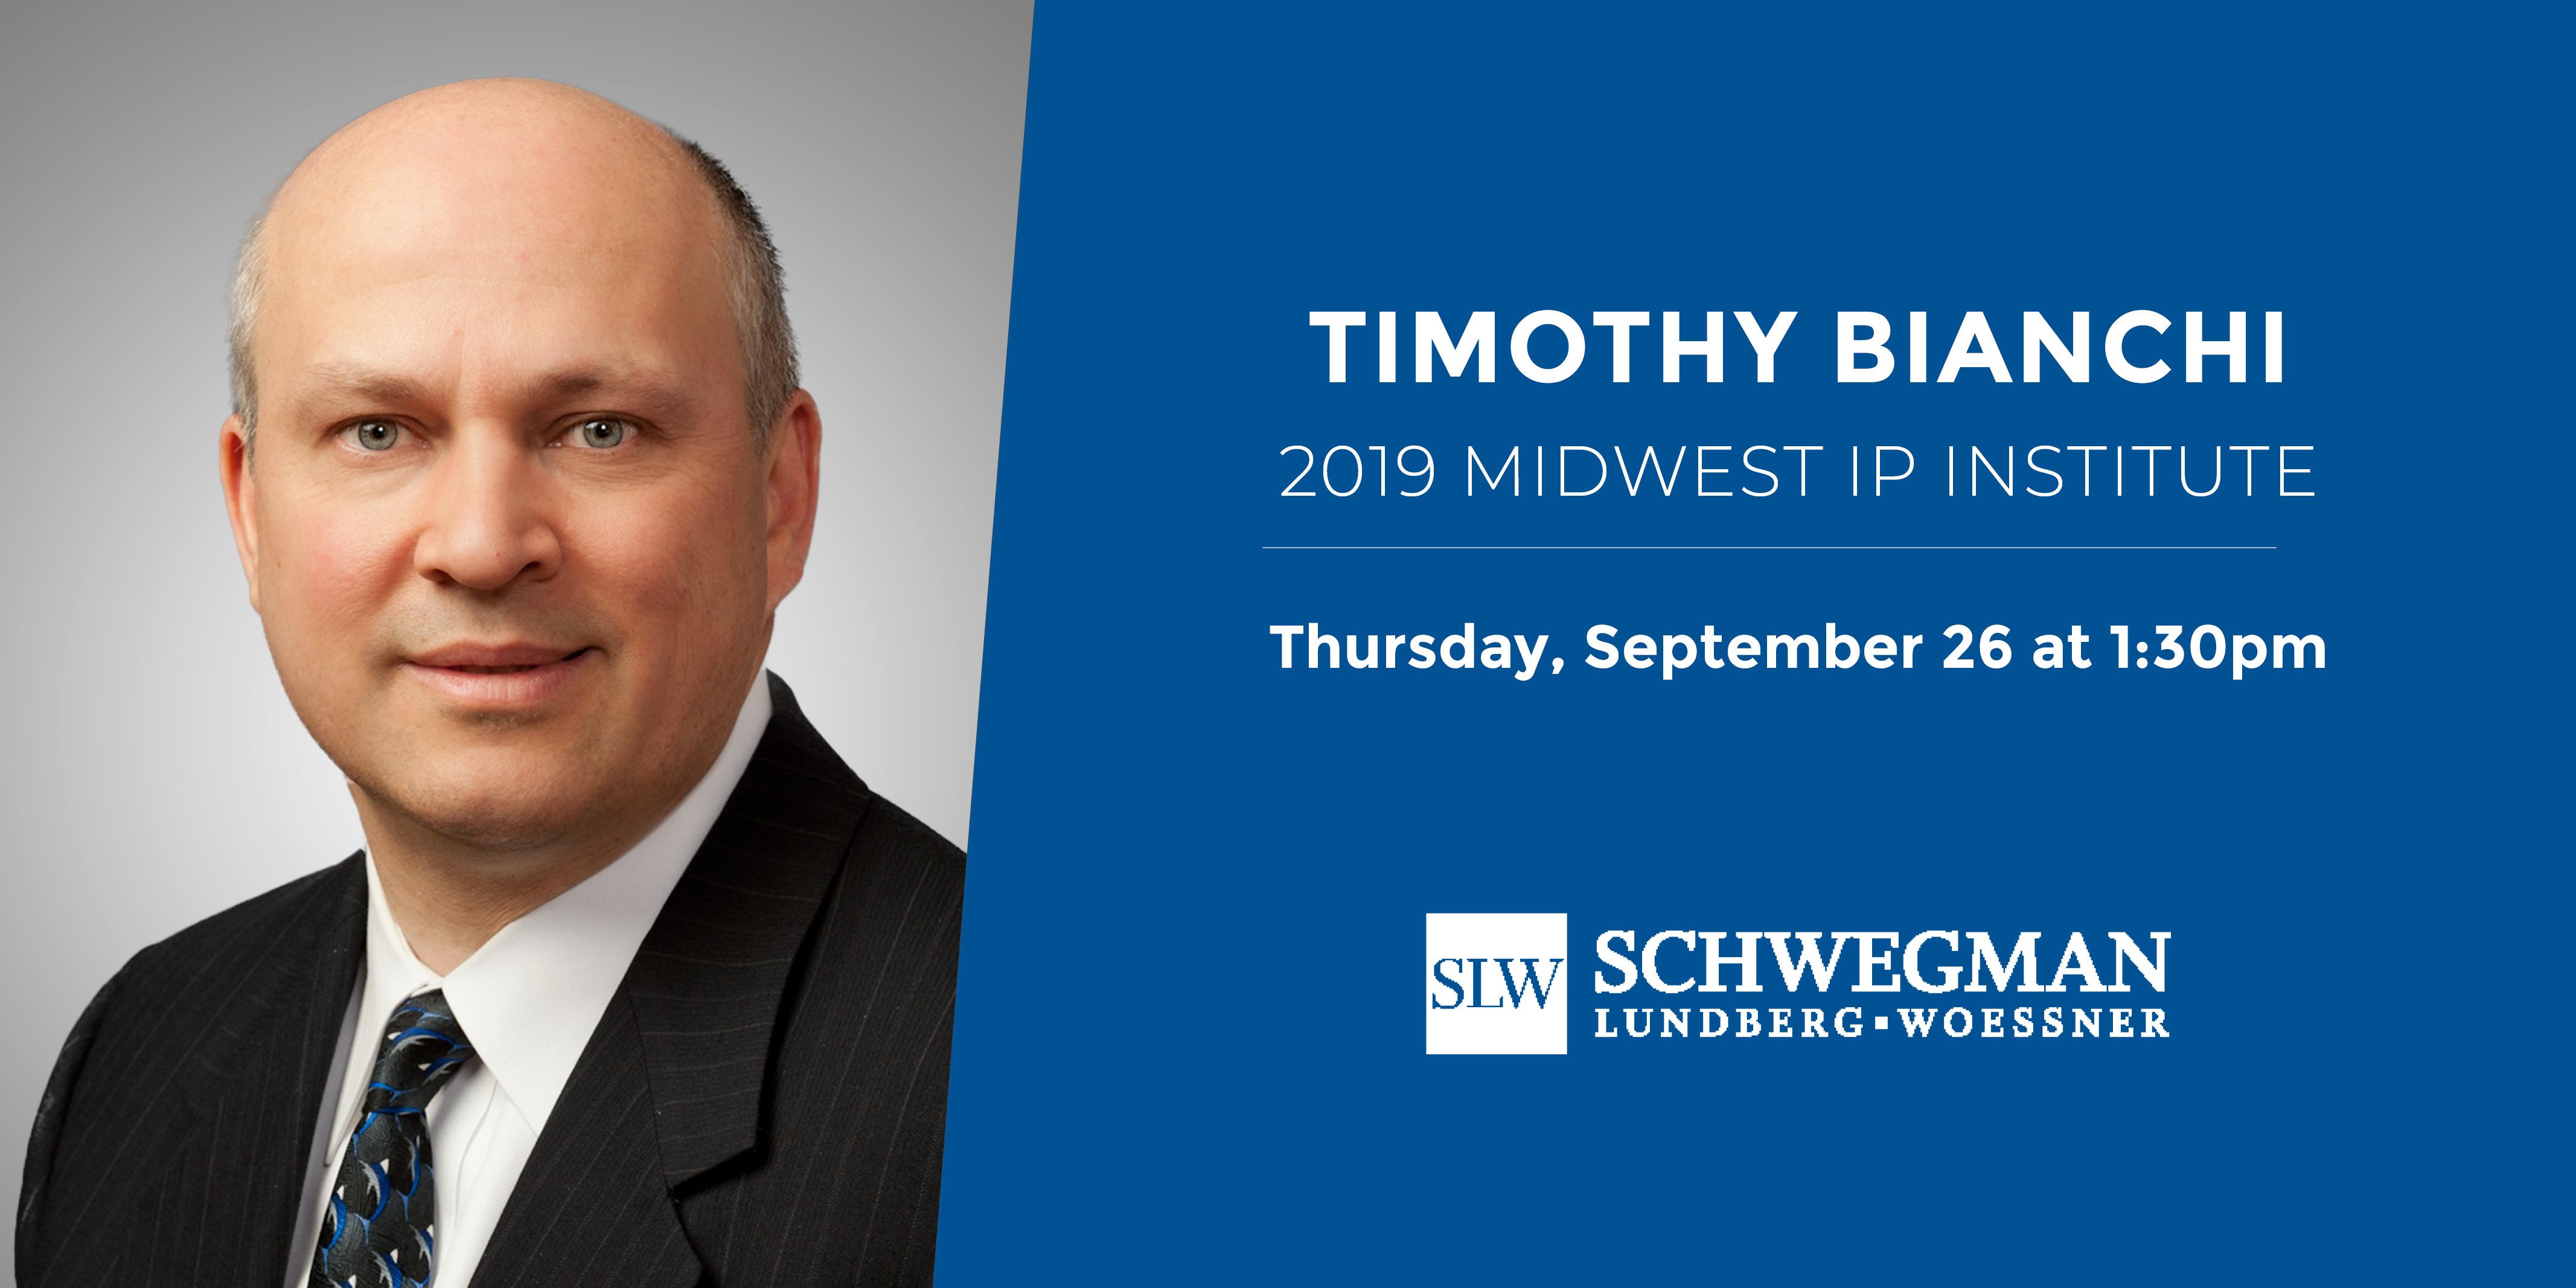 Tim Bianchi Midwest IP Institute